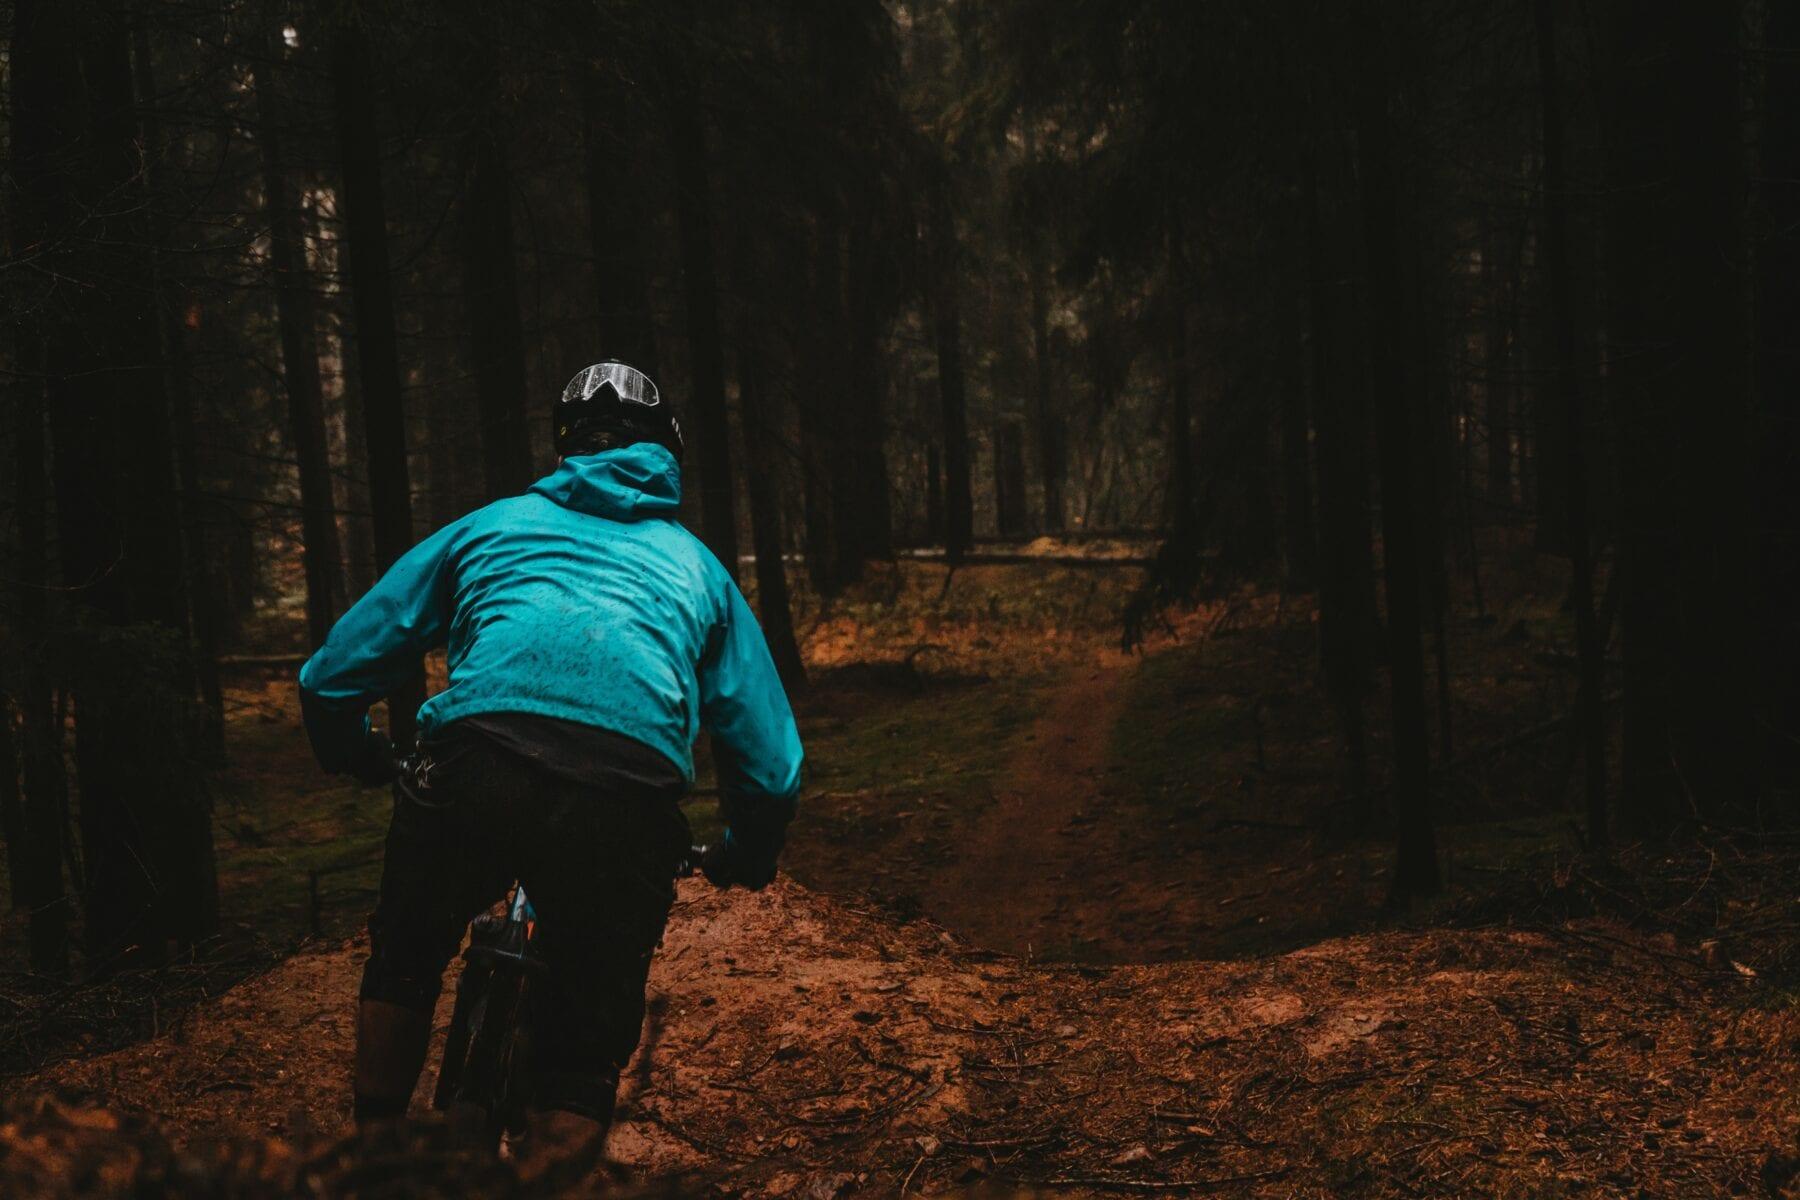 Mountainbike mtb-vignet natuurmonumenten